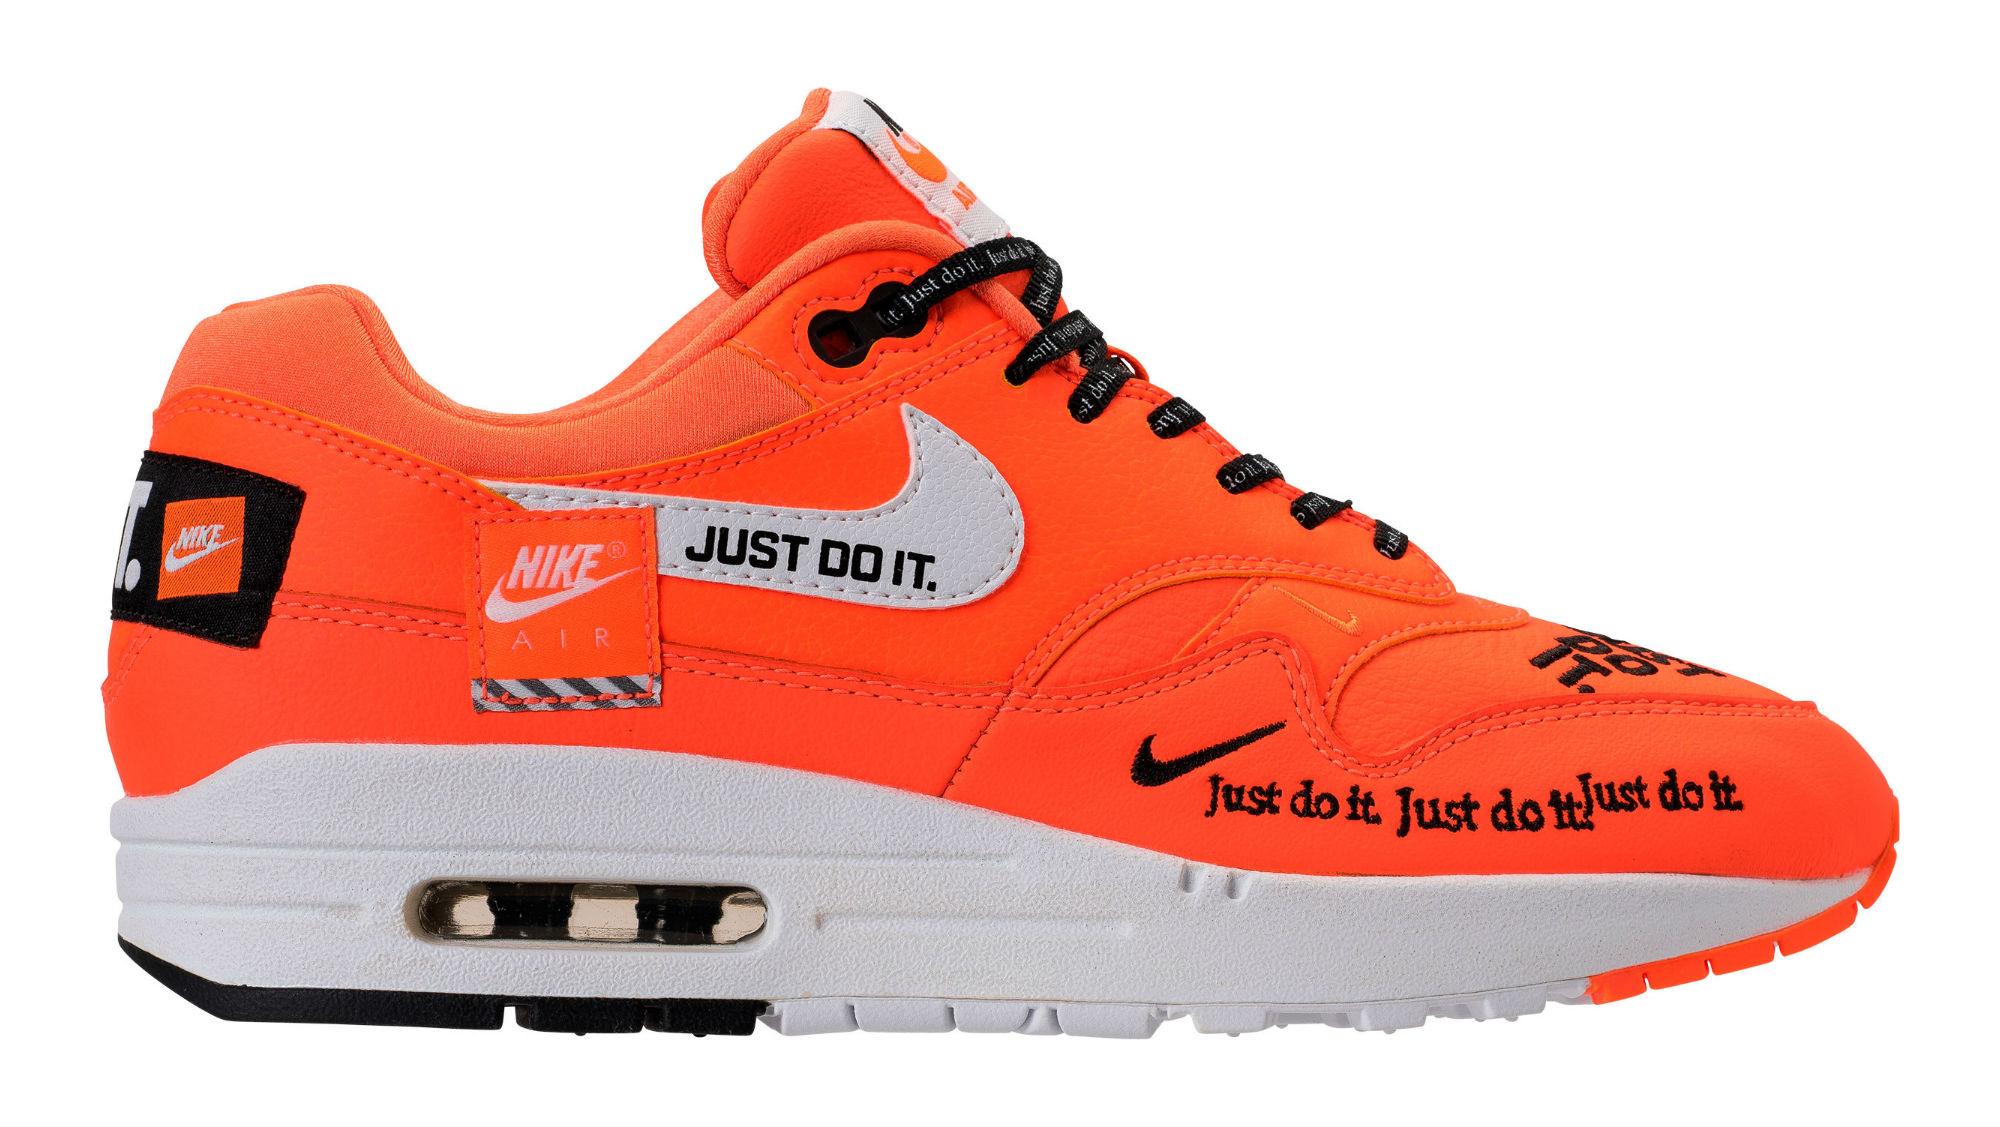 Nike Air Max 1 Just Do It Orange Release Date 917691-800 Profile ...